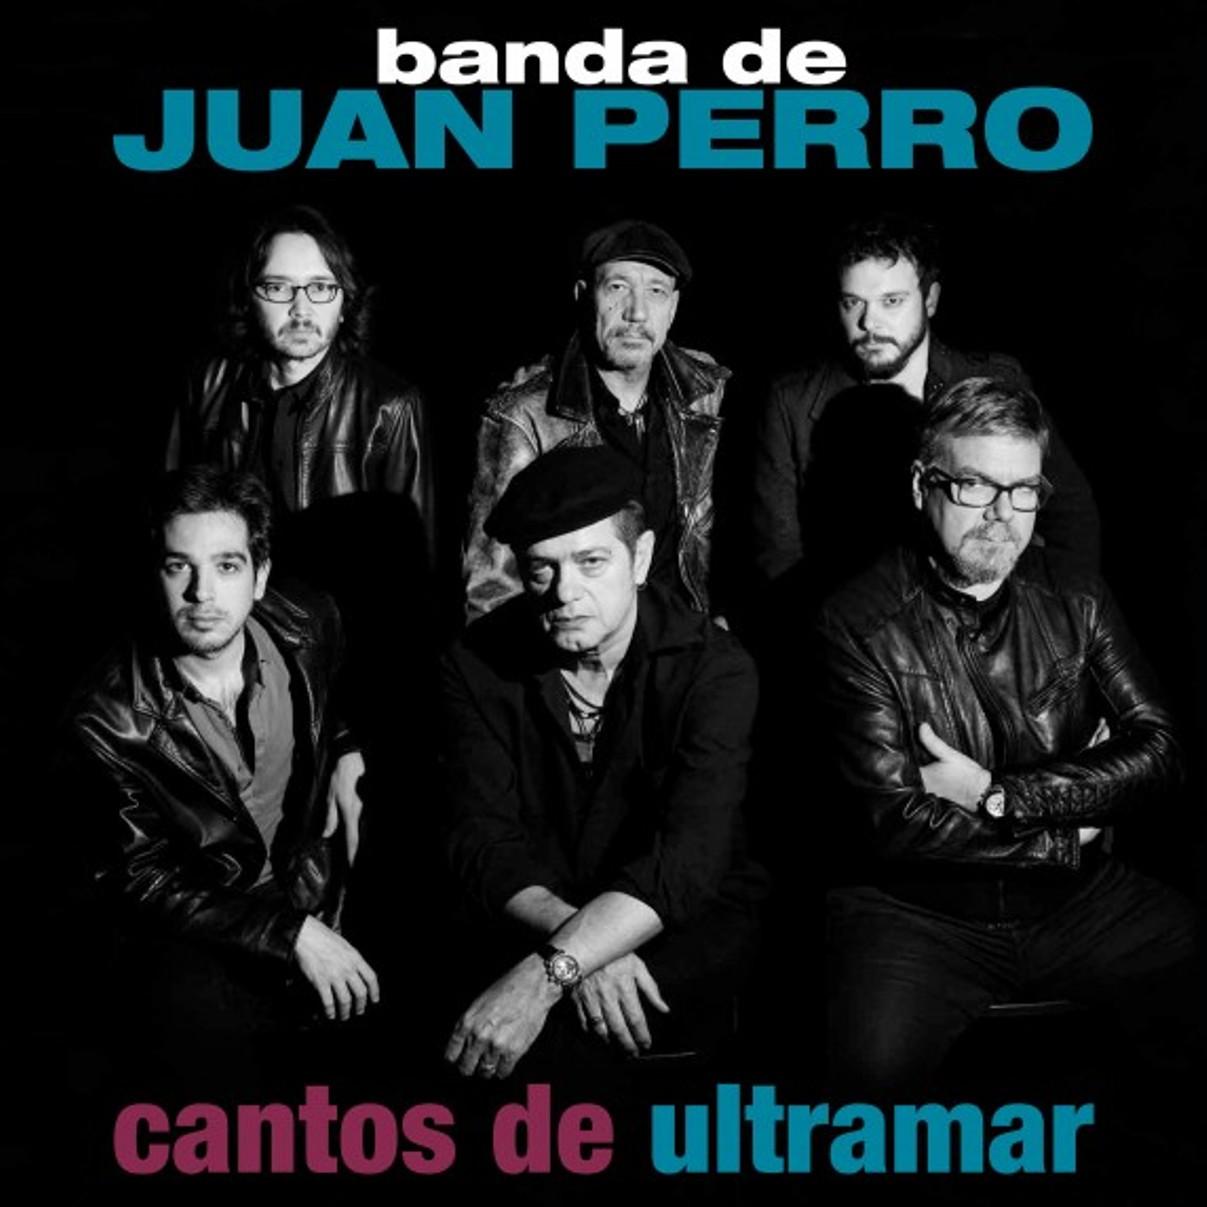 Juanperro Cantos De Ultramar